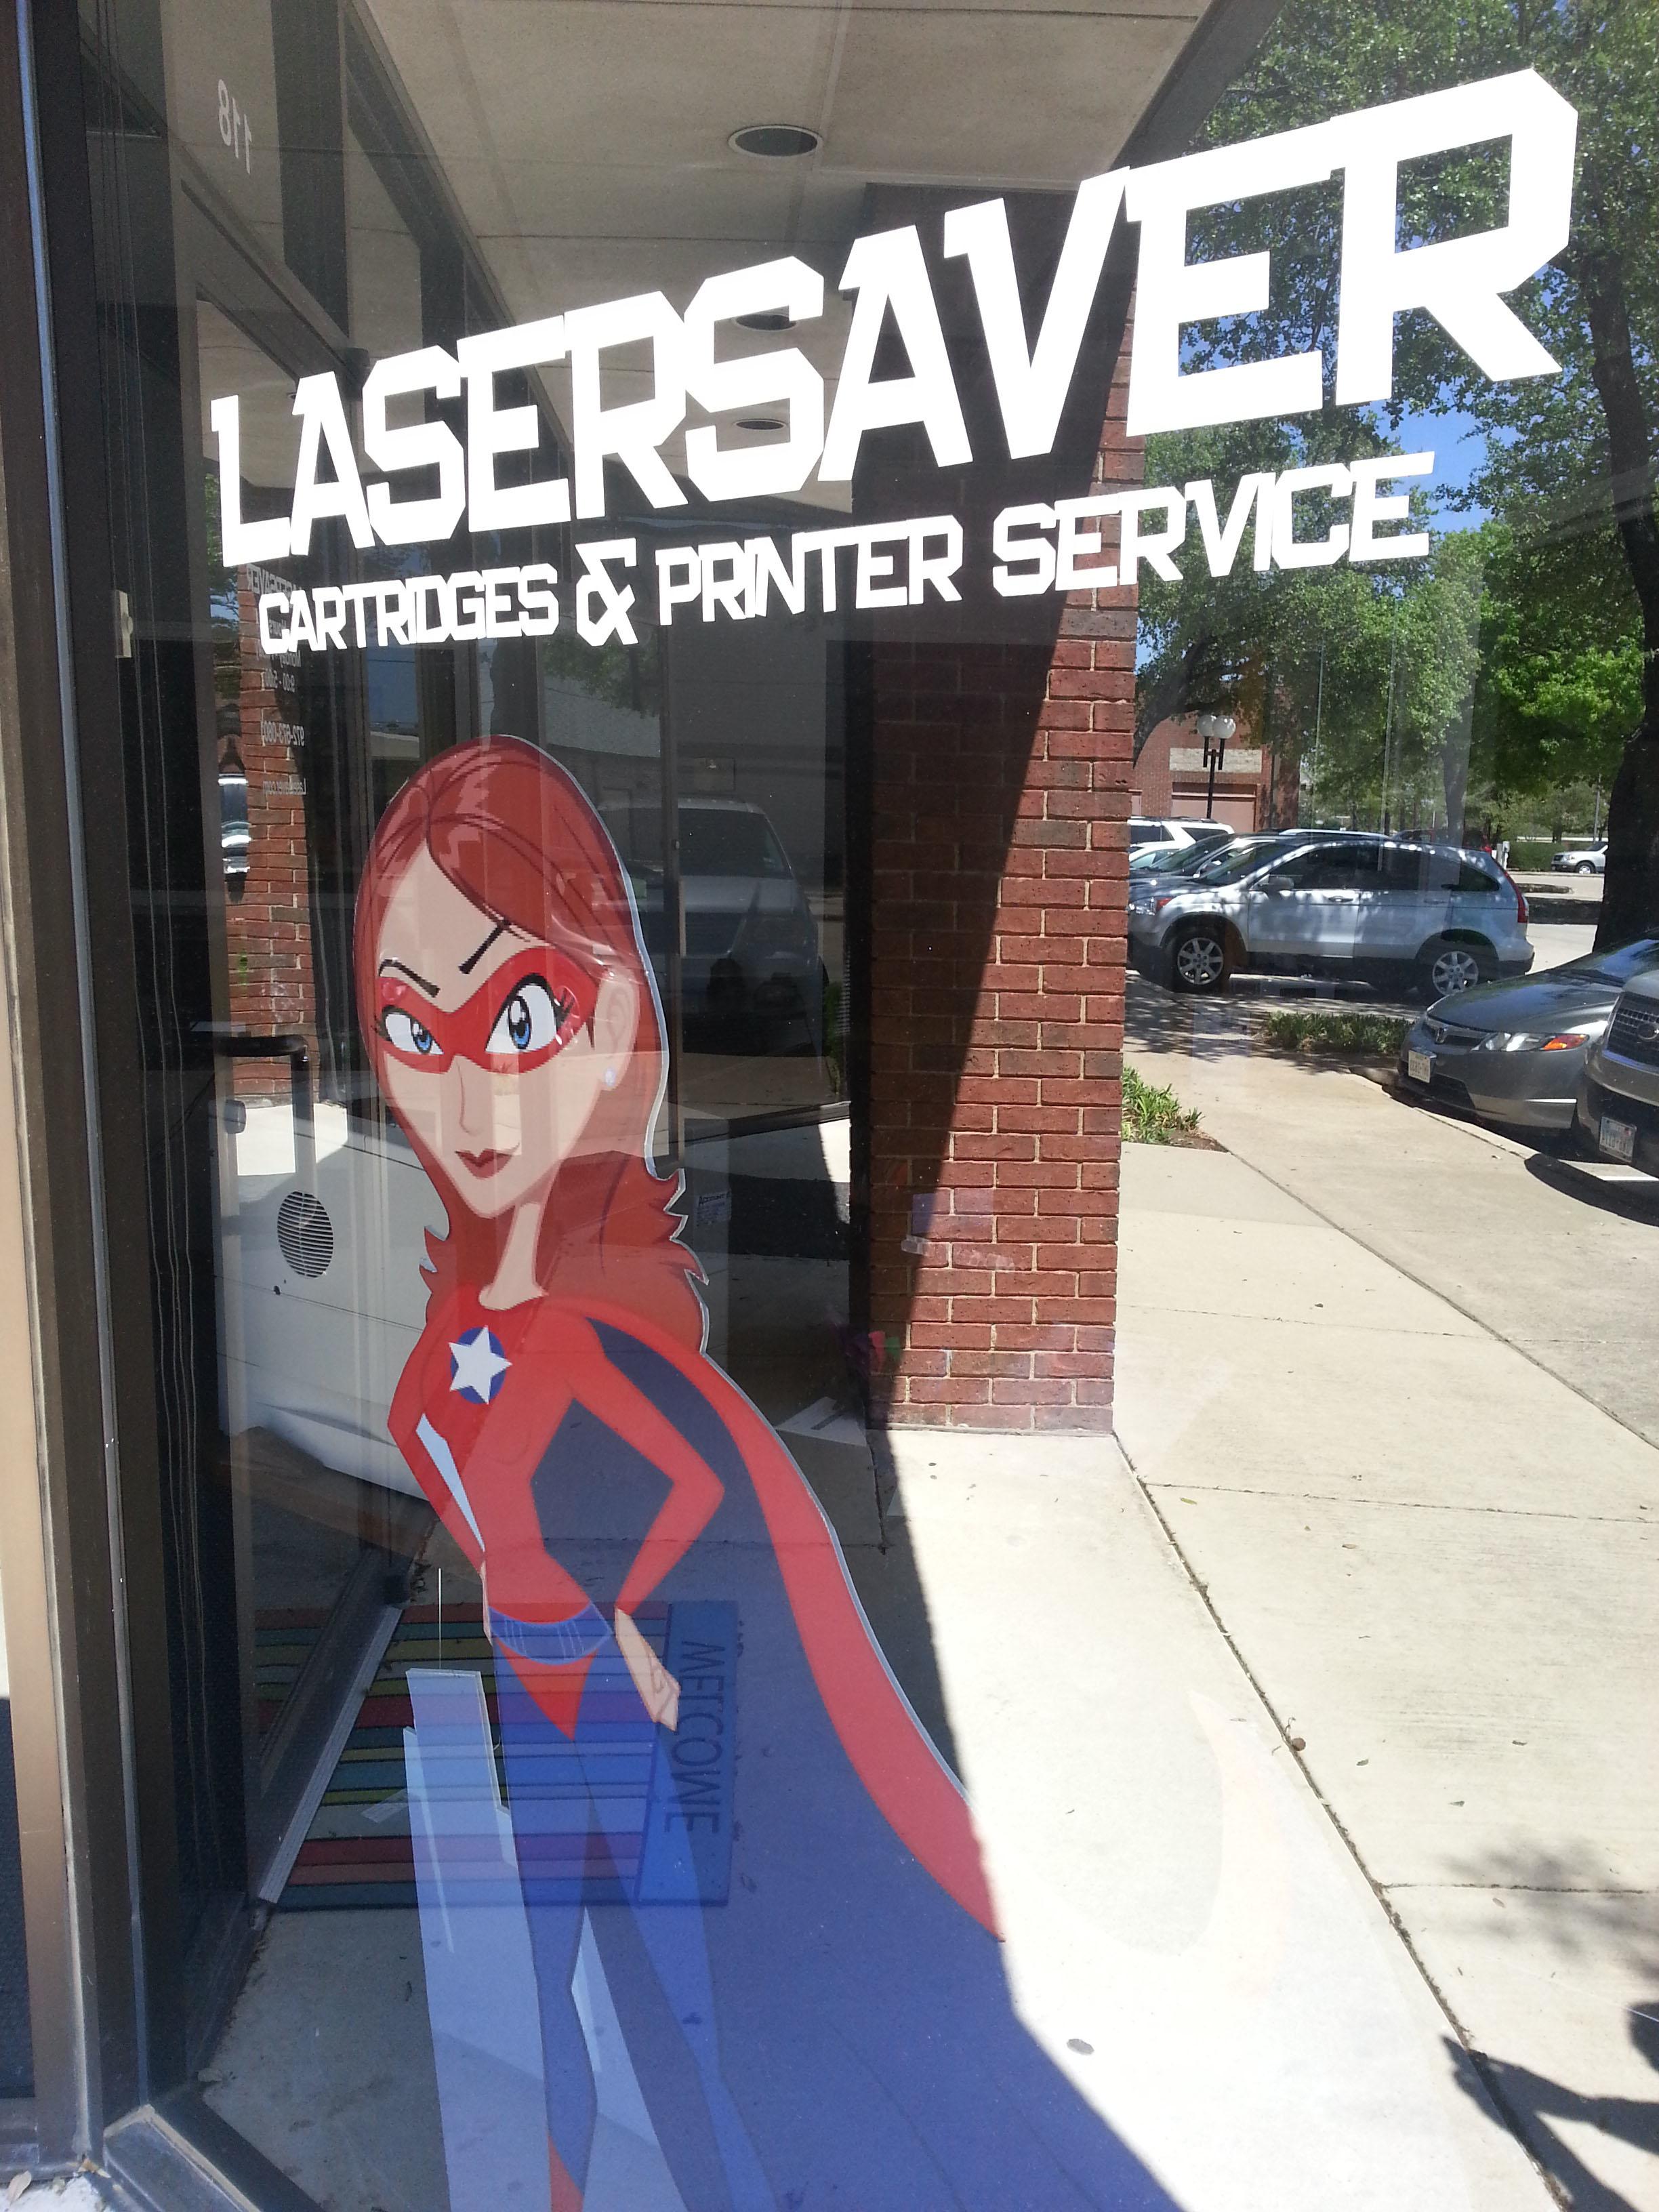 LaserSaver